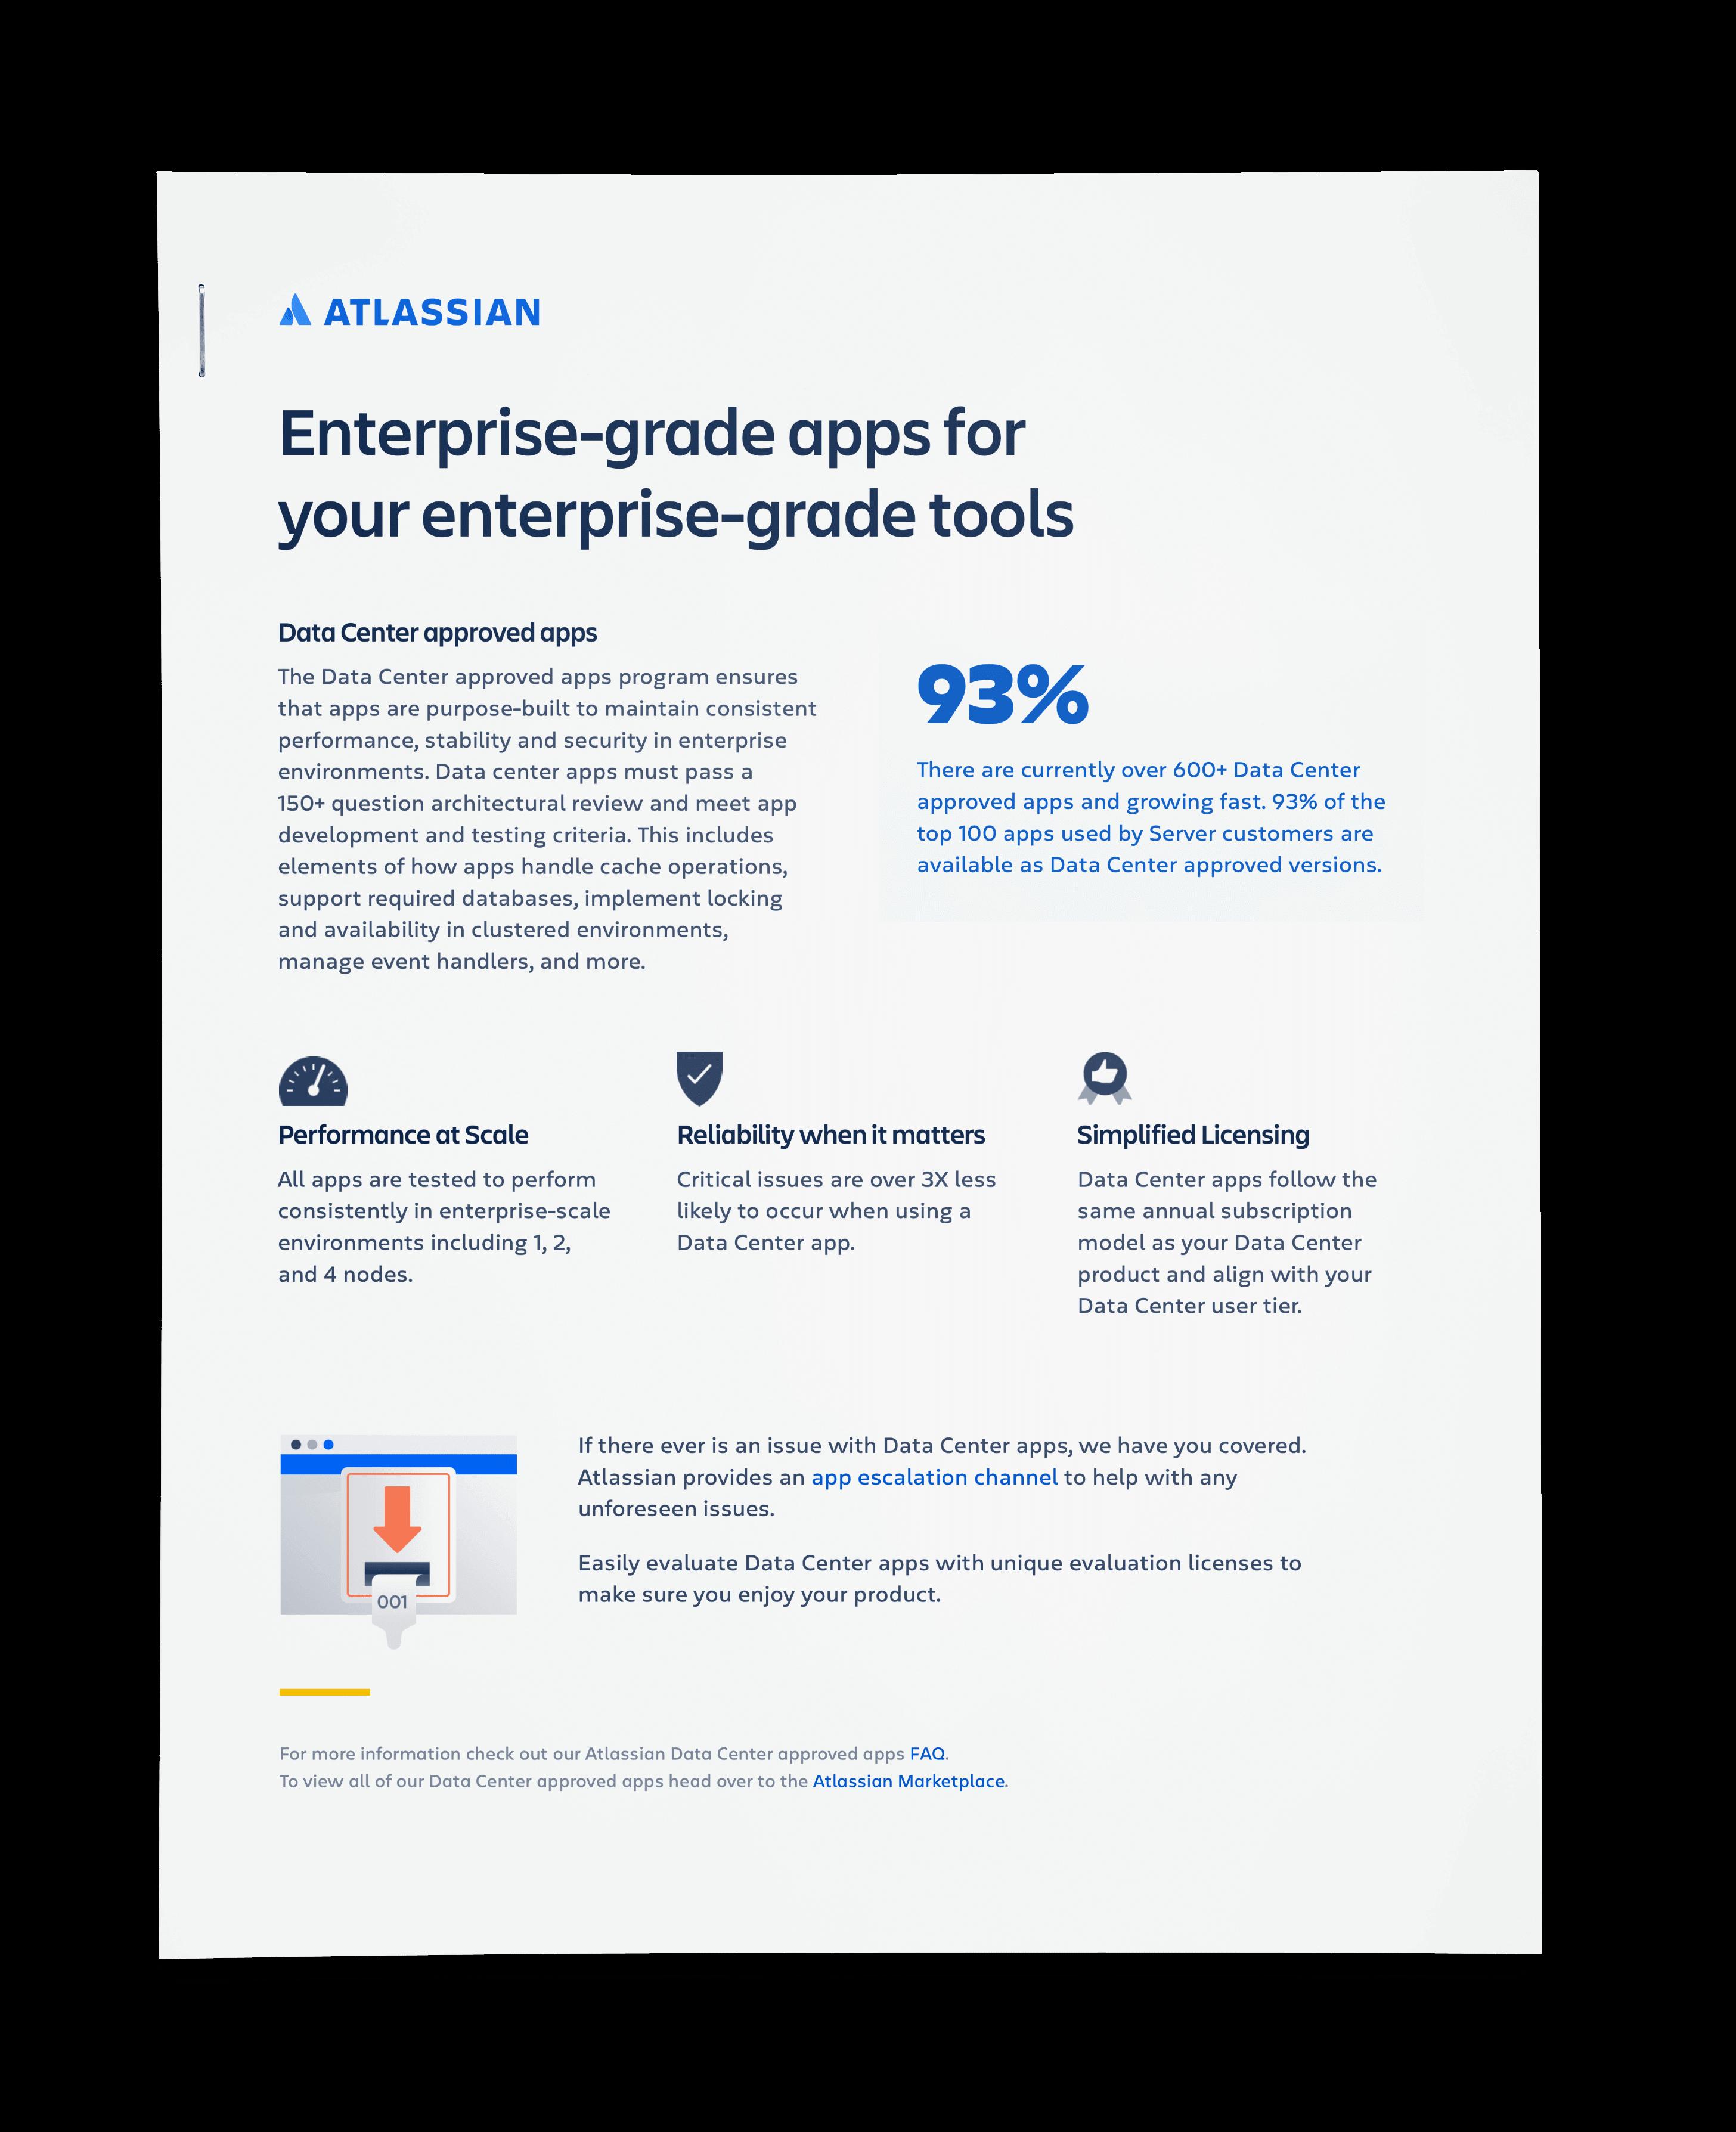 Enterprise-grade apps for your enterprise-grade tools one pager